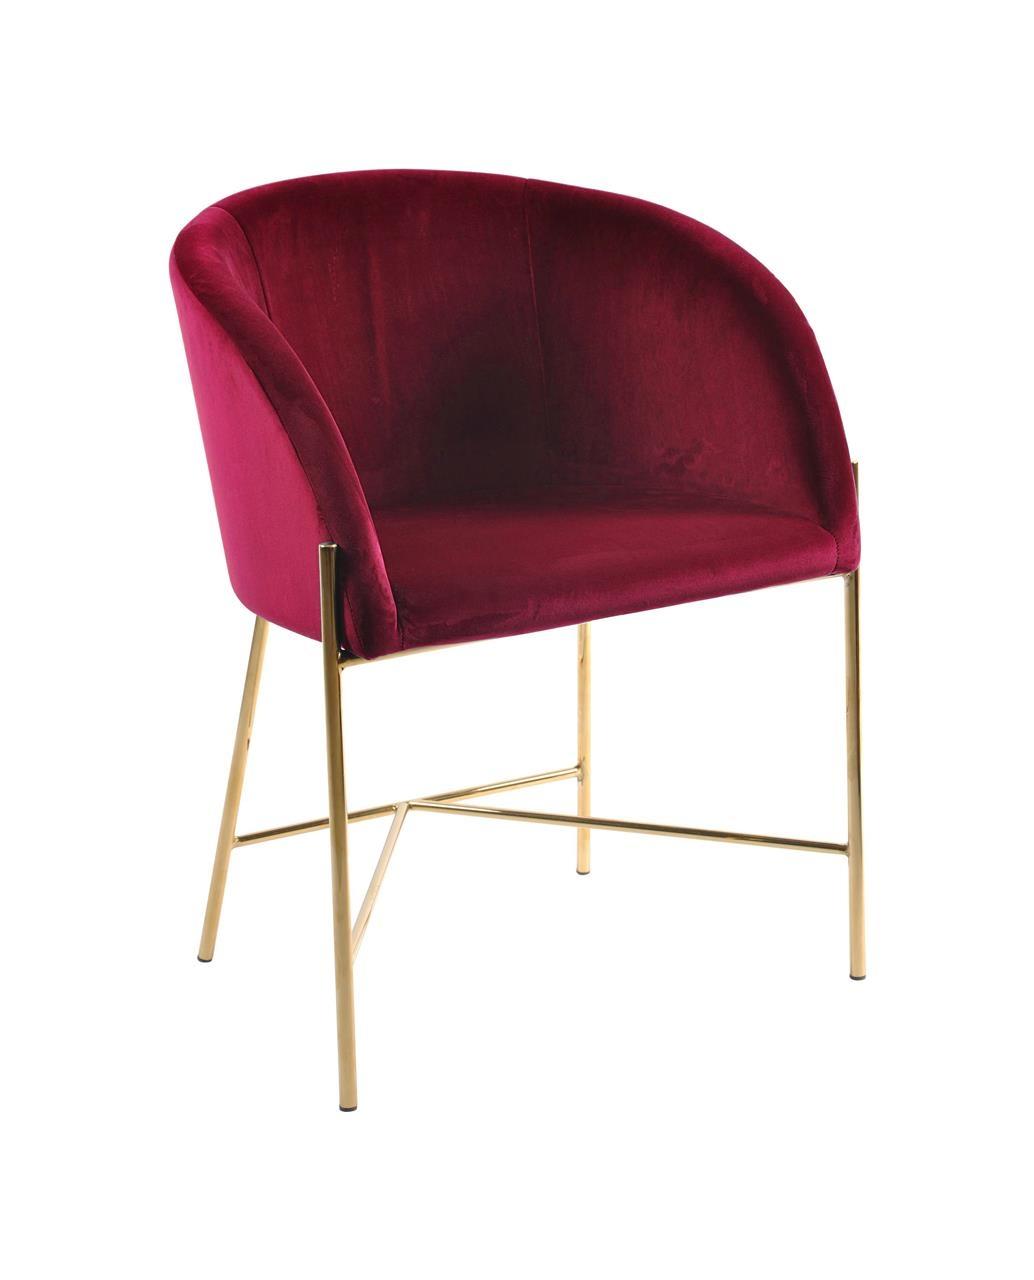 Scaun tapitat cu stofa si picioare metalice Nelson Velvet Bordeaux / Auriu, l56xA54xH76 cm